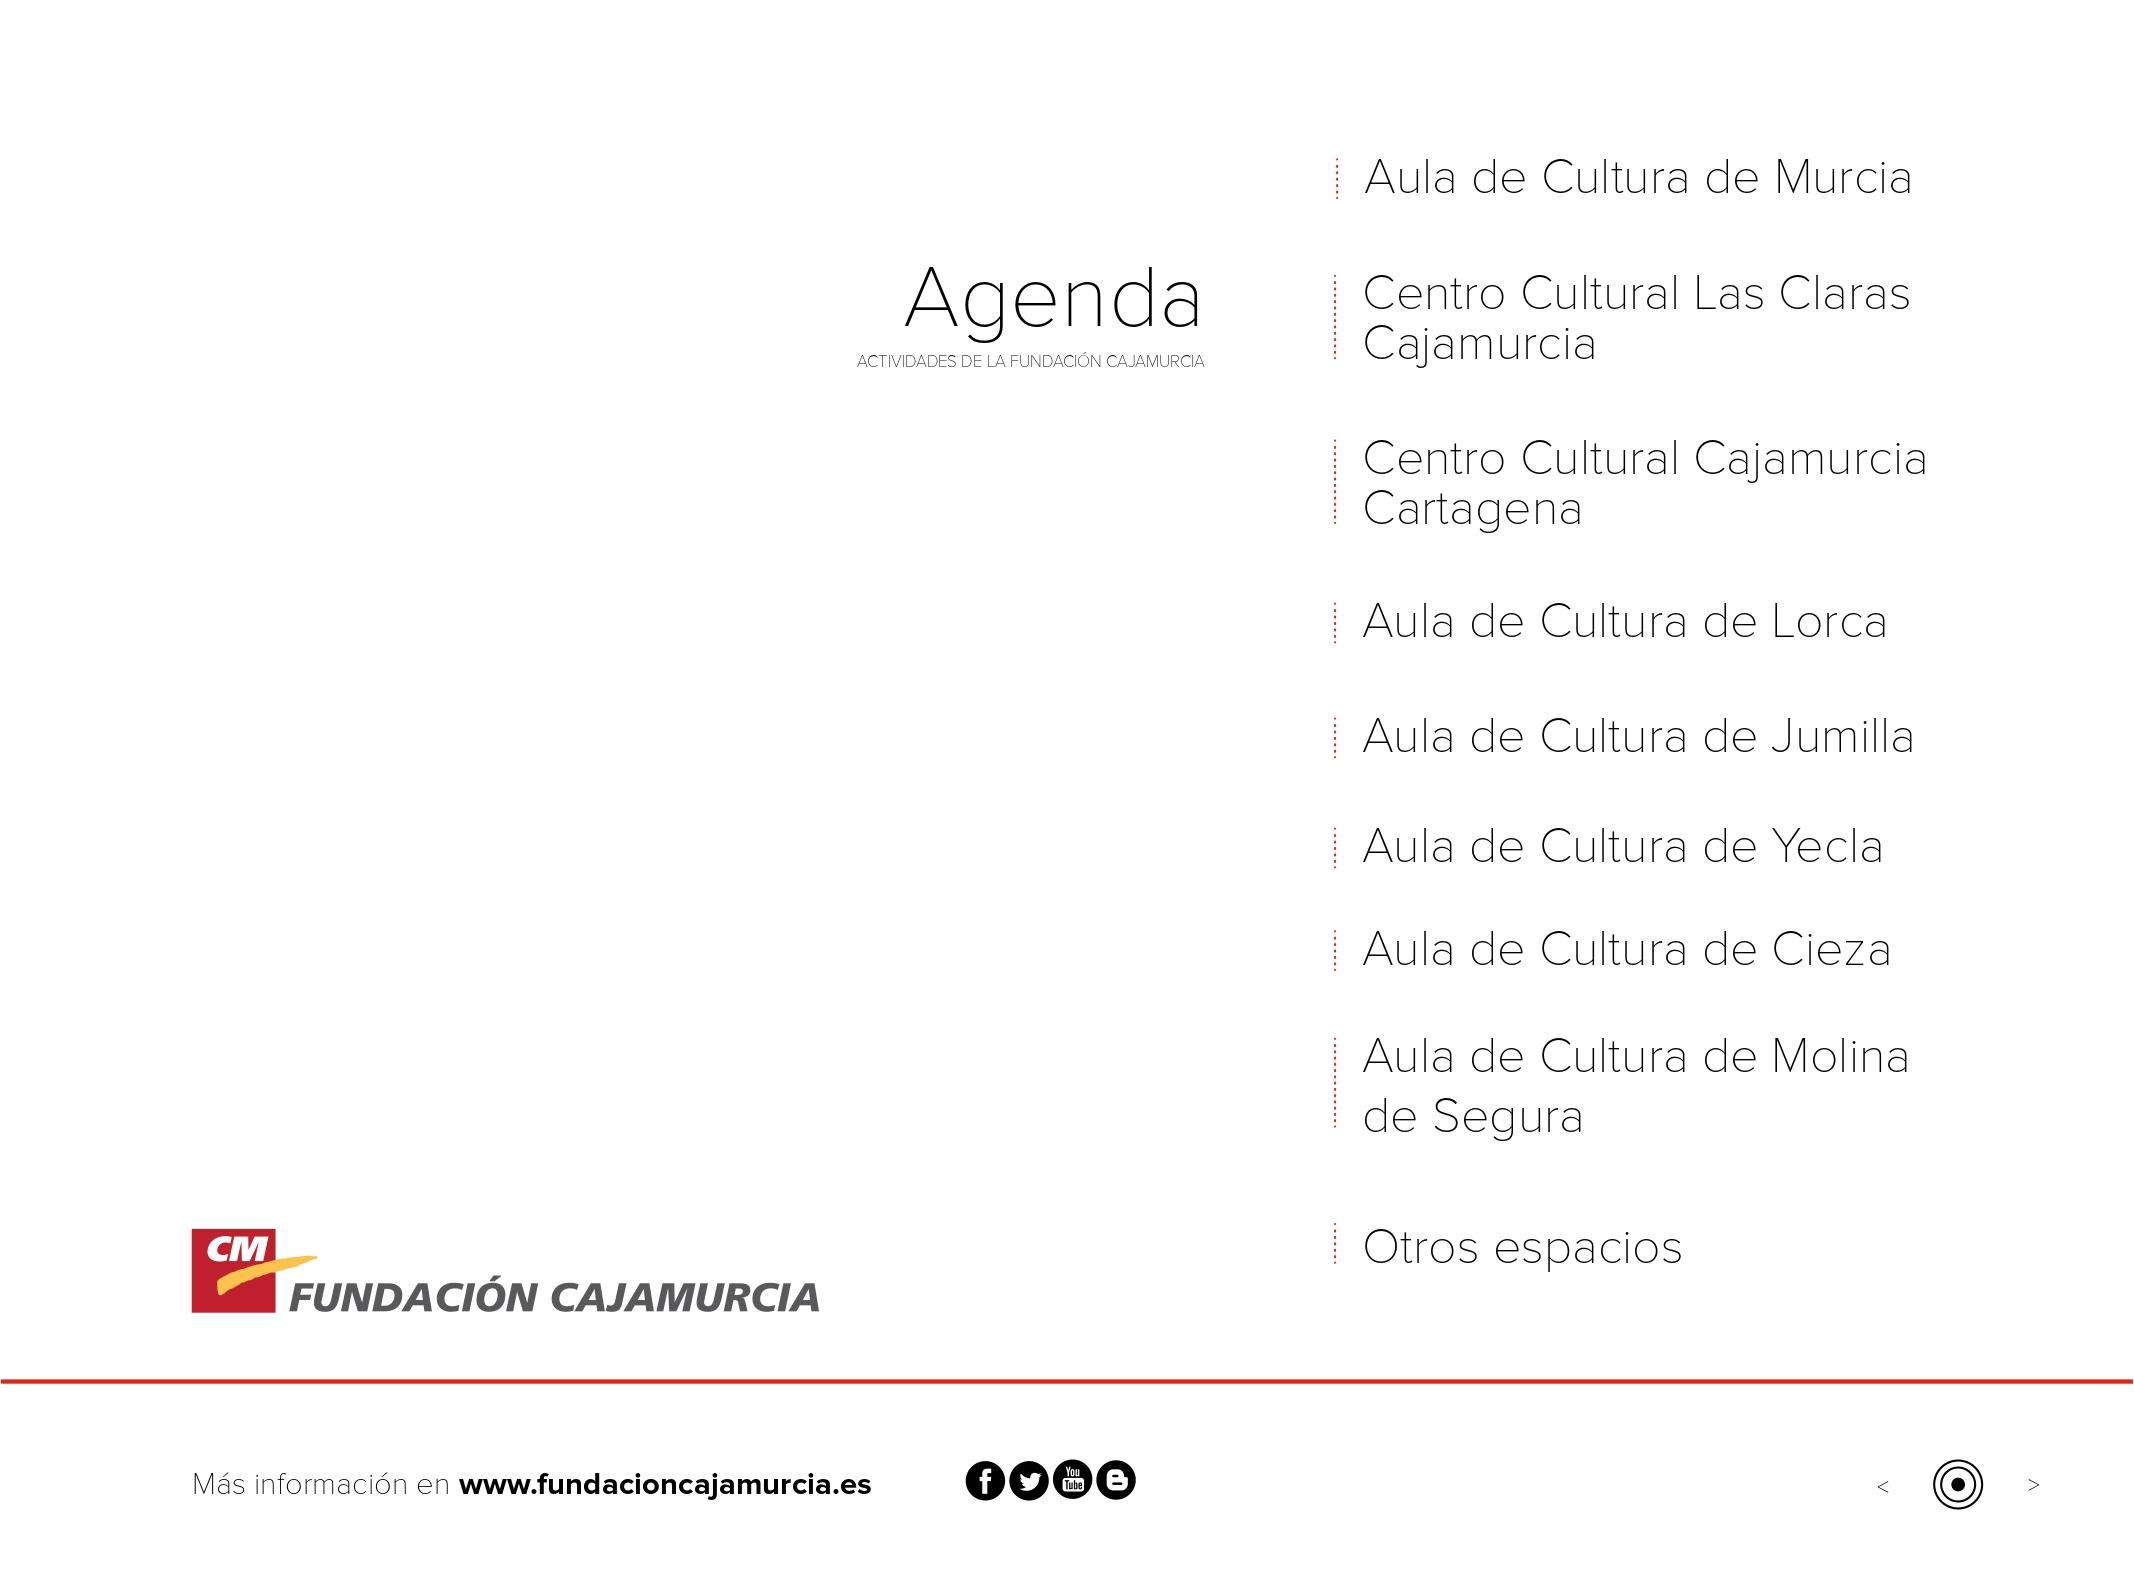 agenda-cajamurcia_page-0002.jpg